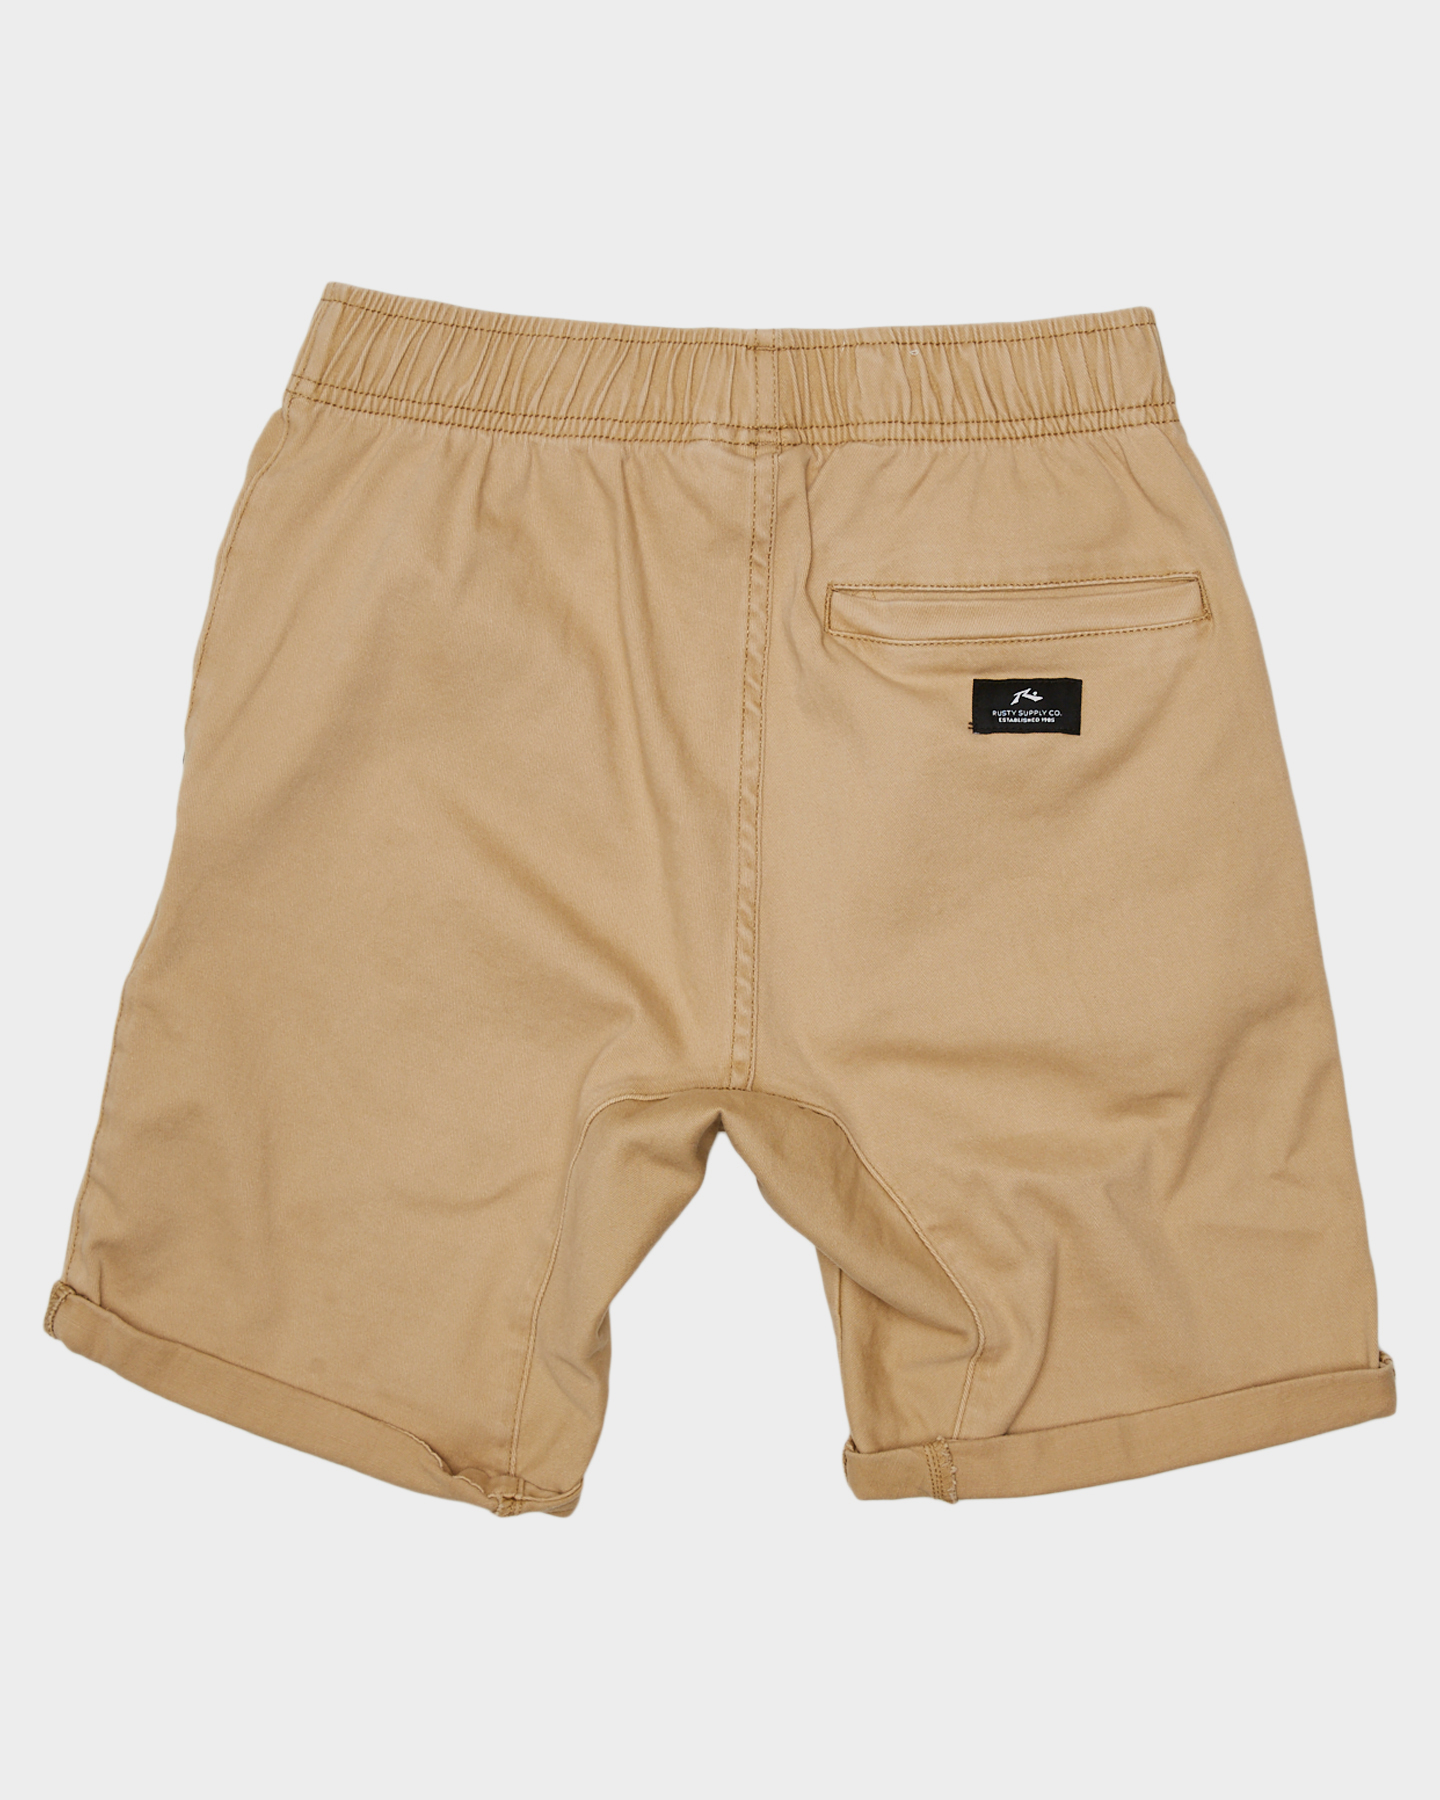 New-Rusty-Boys-Kids-Boys-Hooked-On-Elastic-Walkshort-Cotton-Black